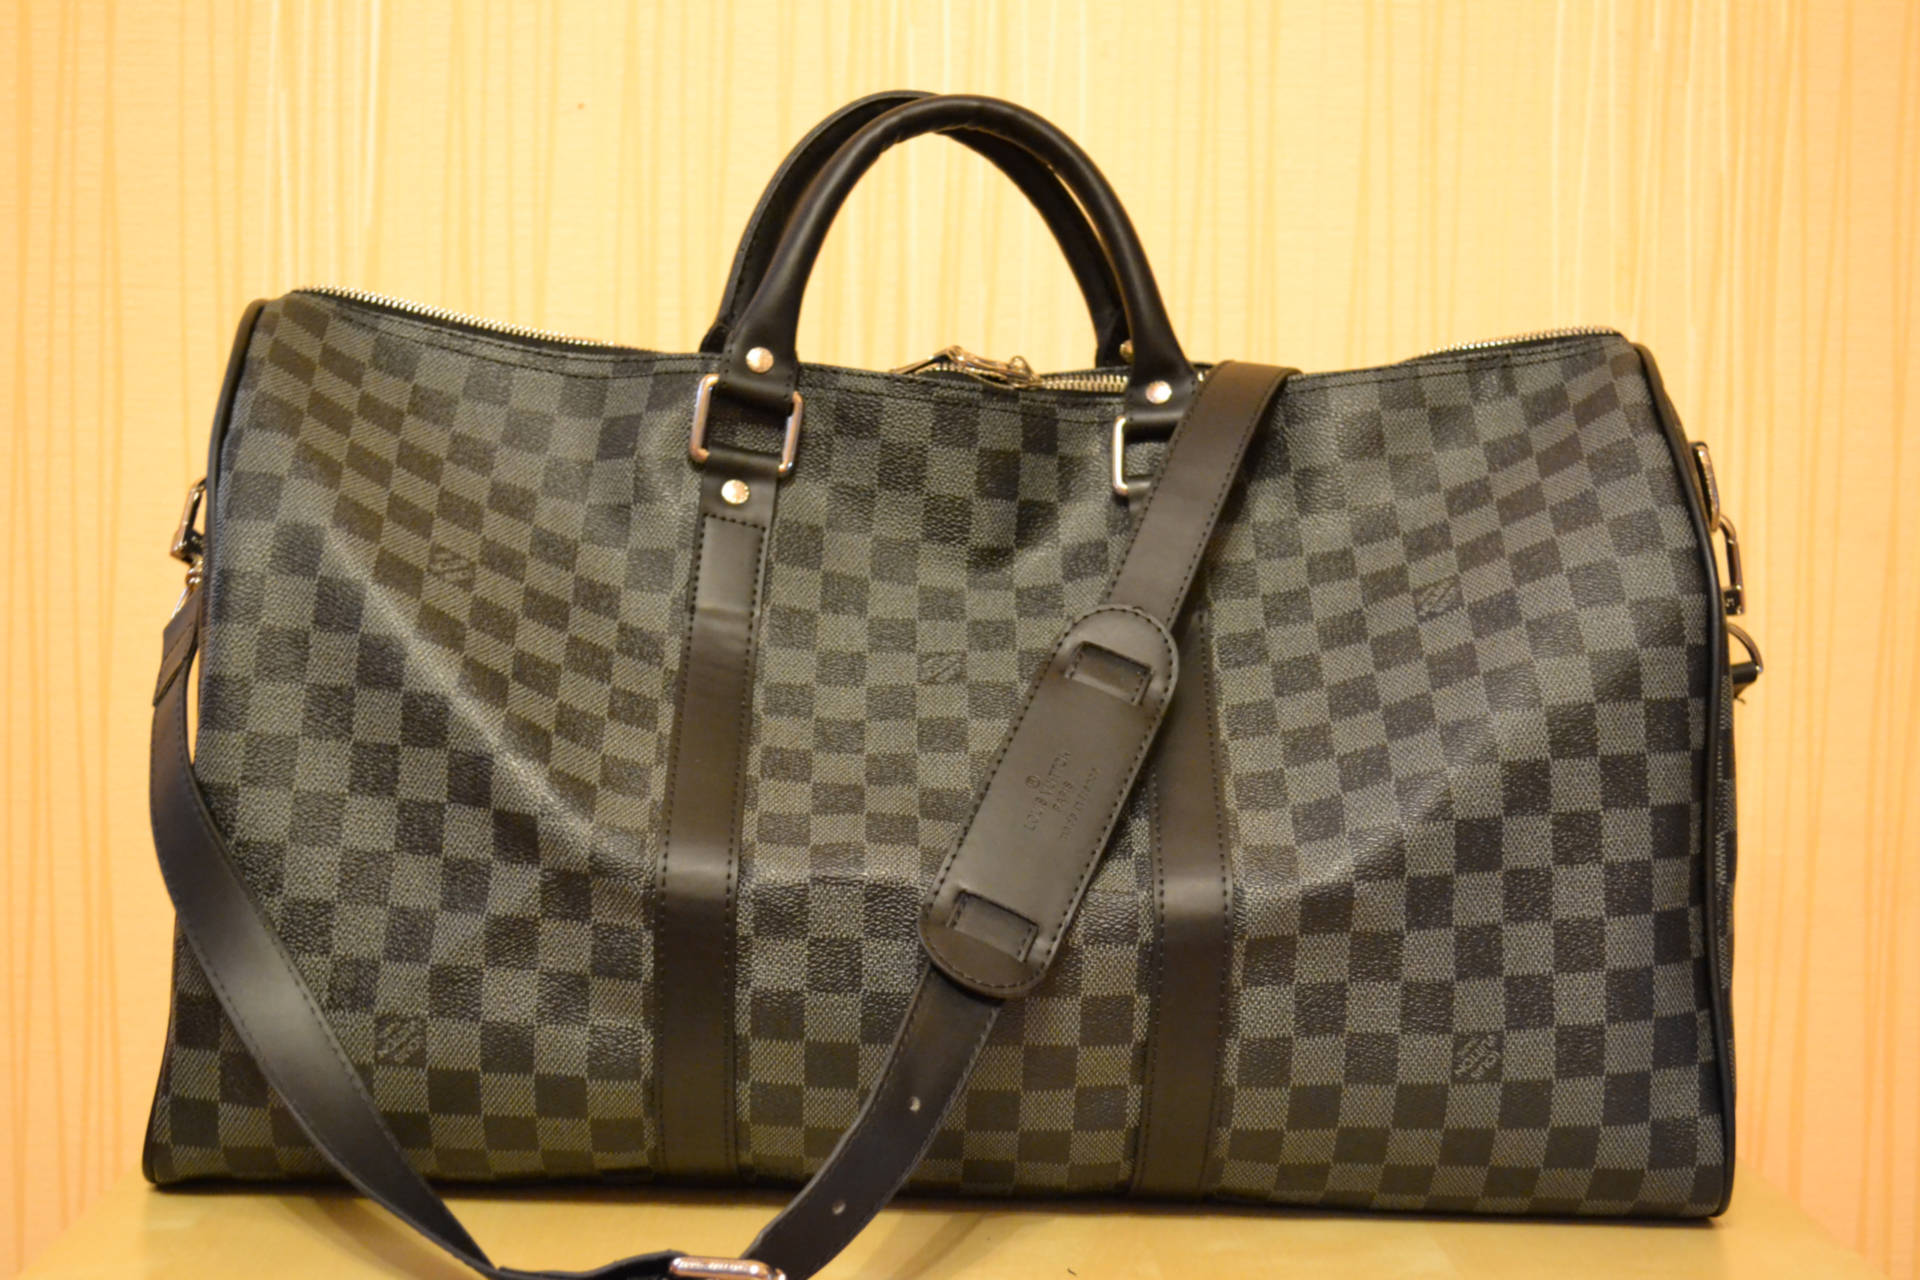 97939a44a534 Копия сумки Louis Vuitton Neverfull, серая, Канва (сумка) + 100% Кожа